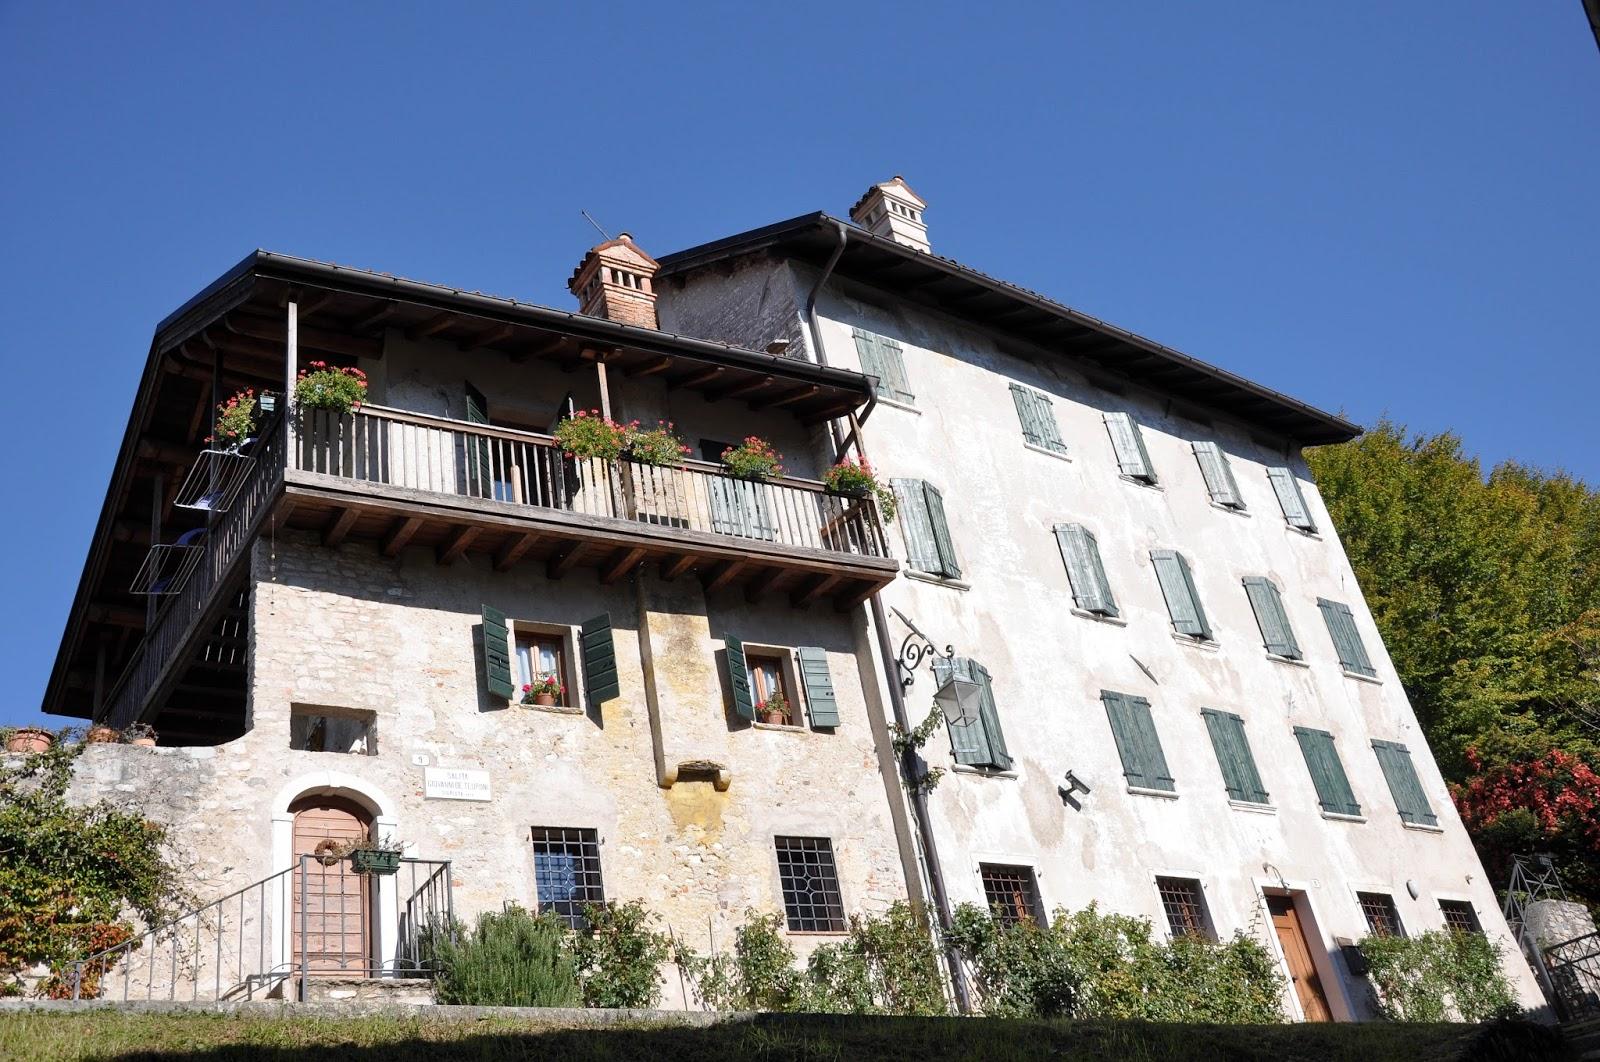 A bonny B&B, Feltre, Veneto, Italy